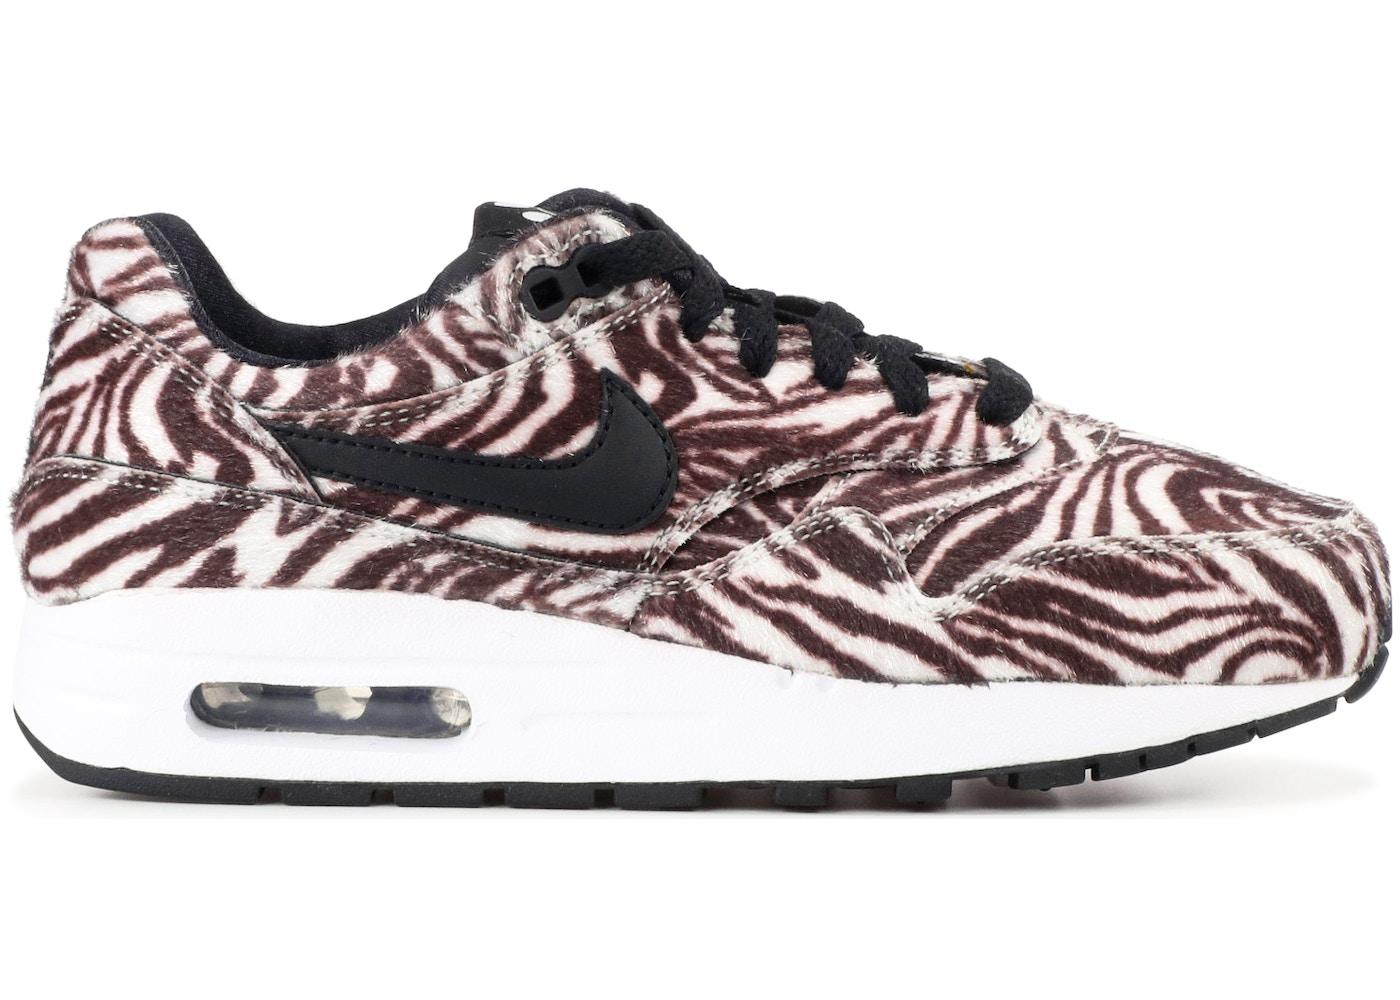 Jadeo viuda novedad  Nike Air Max 1 Zebra (GS) - 827657-100